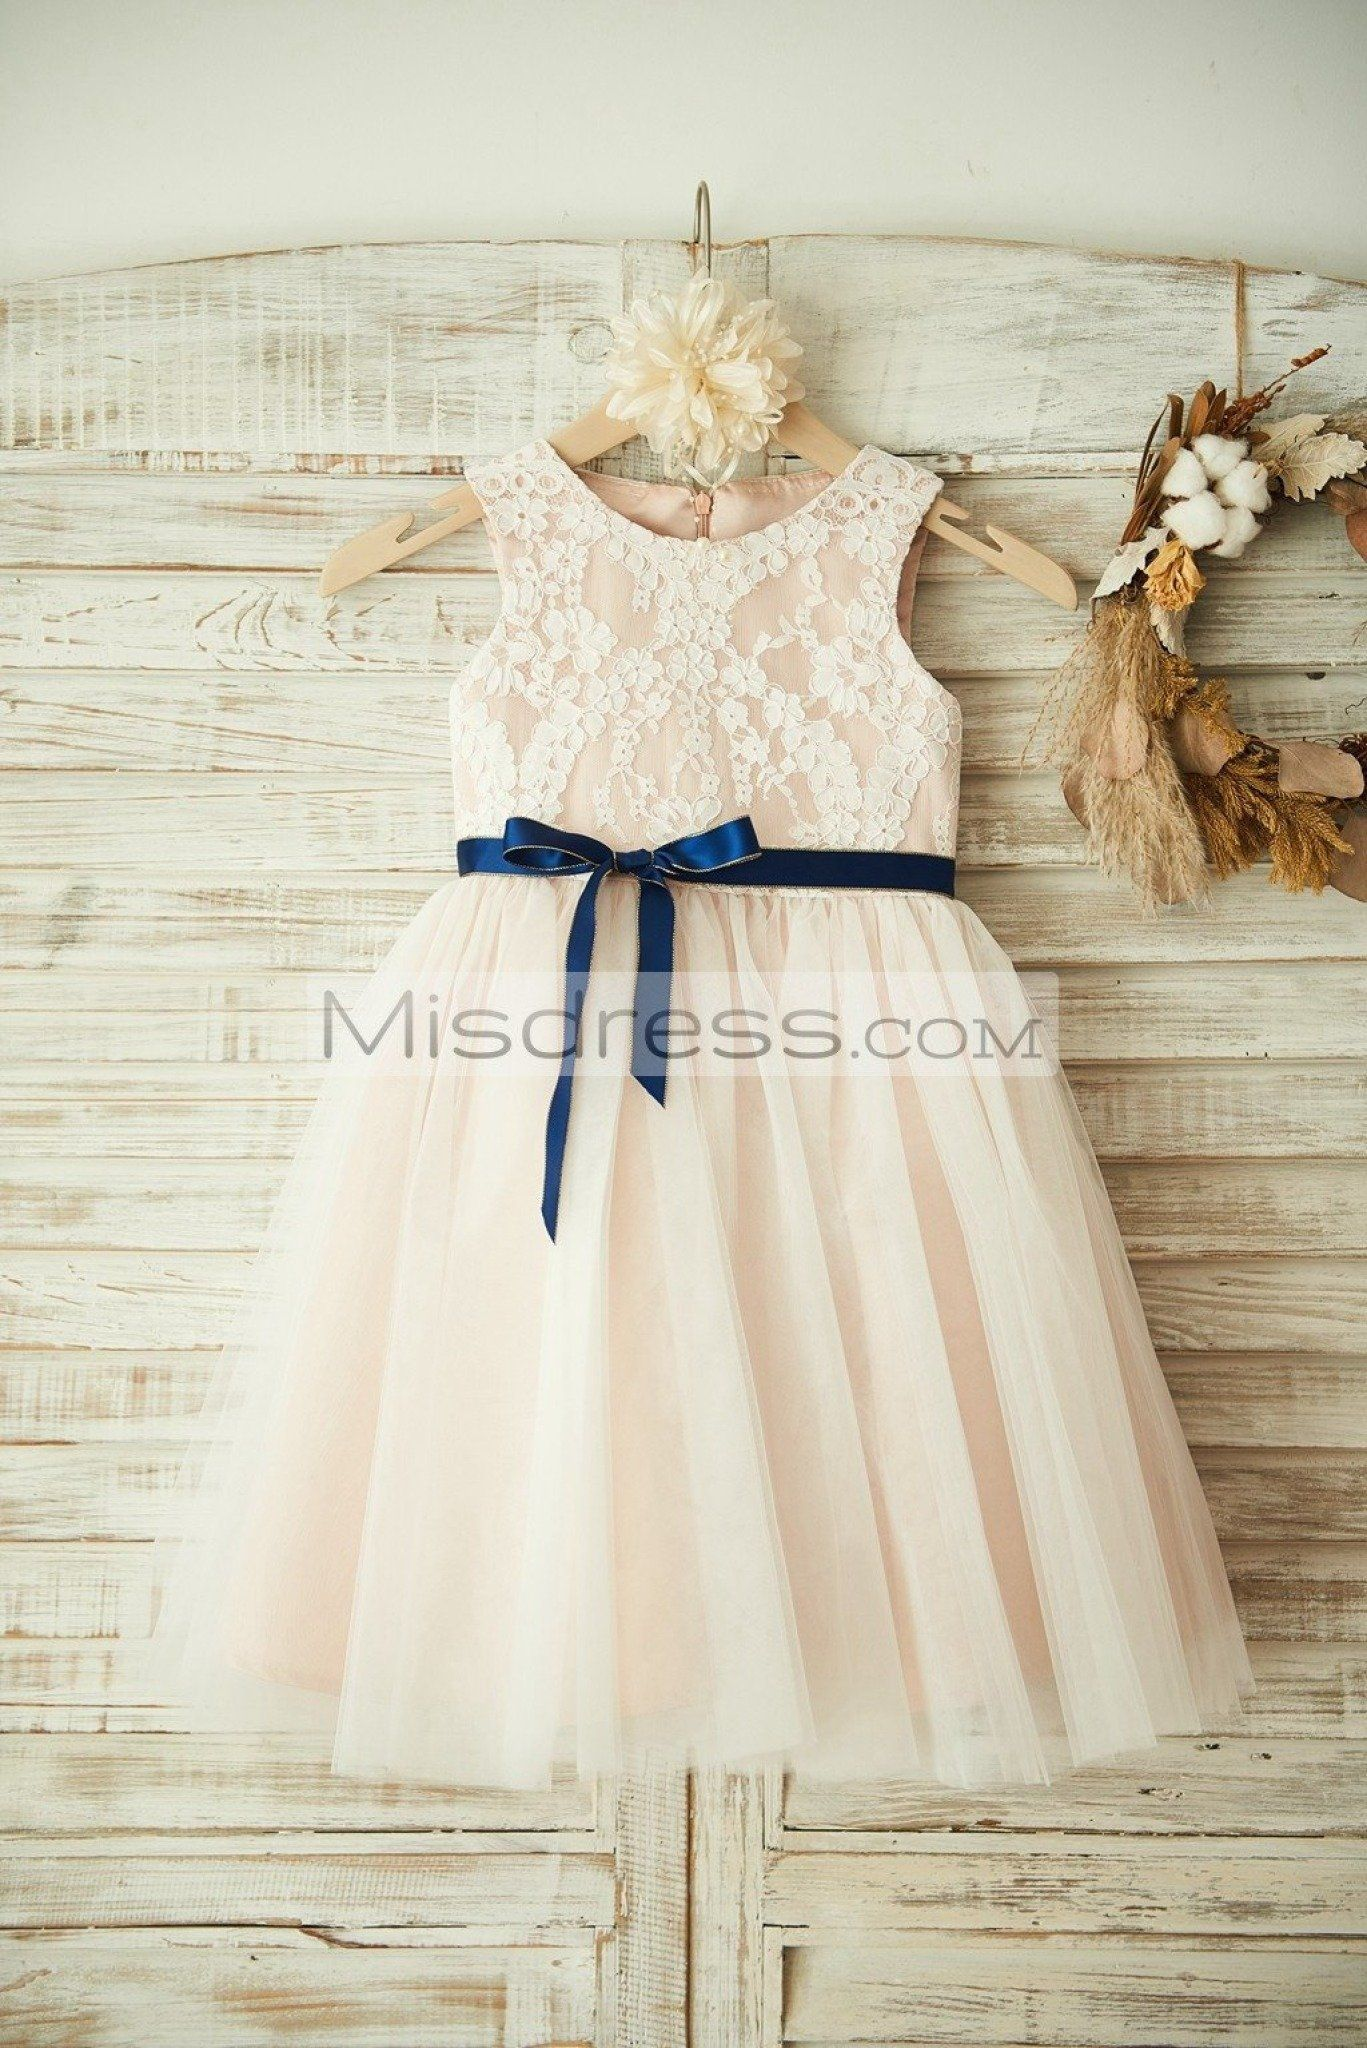 1da06de0e7 Ivory Lace Tulle Pink Lining Wedding Flower Girl Dress with Navy Blue Sash  SKU  K1003354 Buy Now   flowergirldress  ivorydress  lacedress